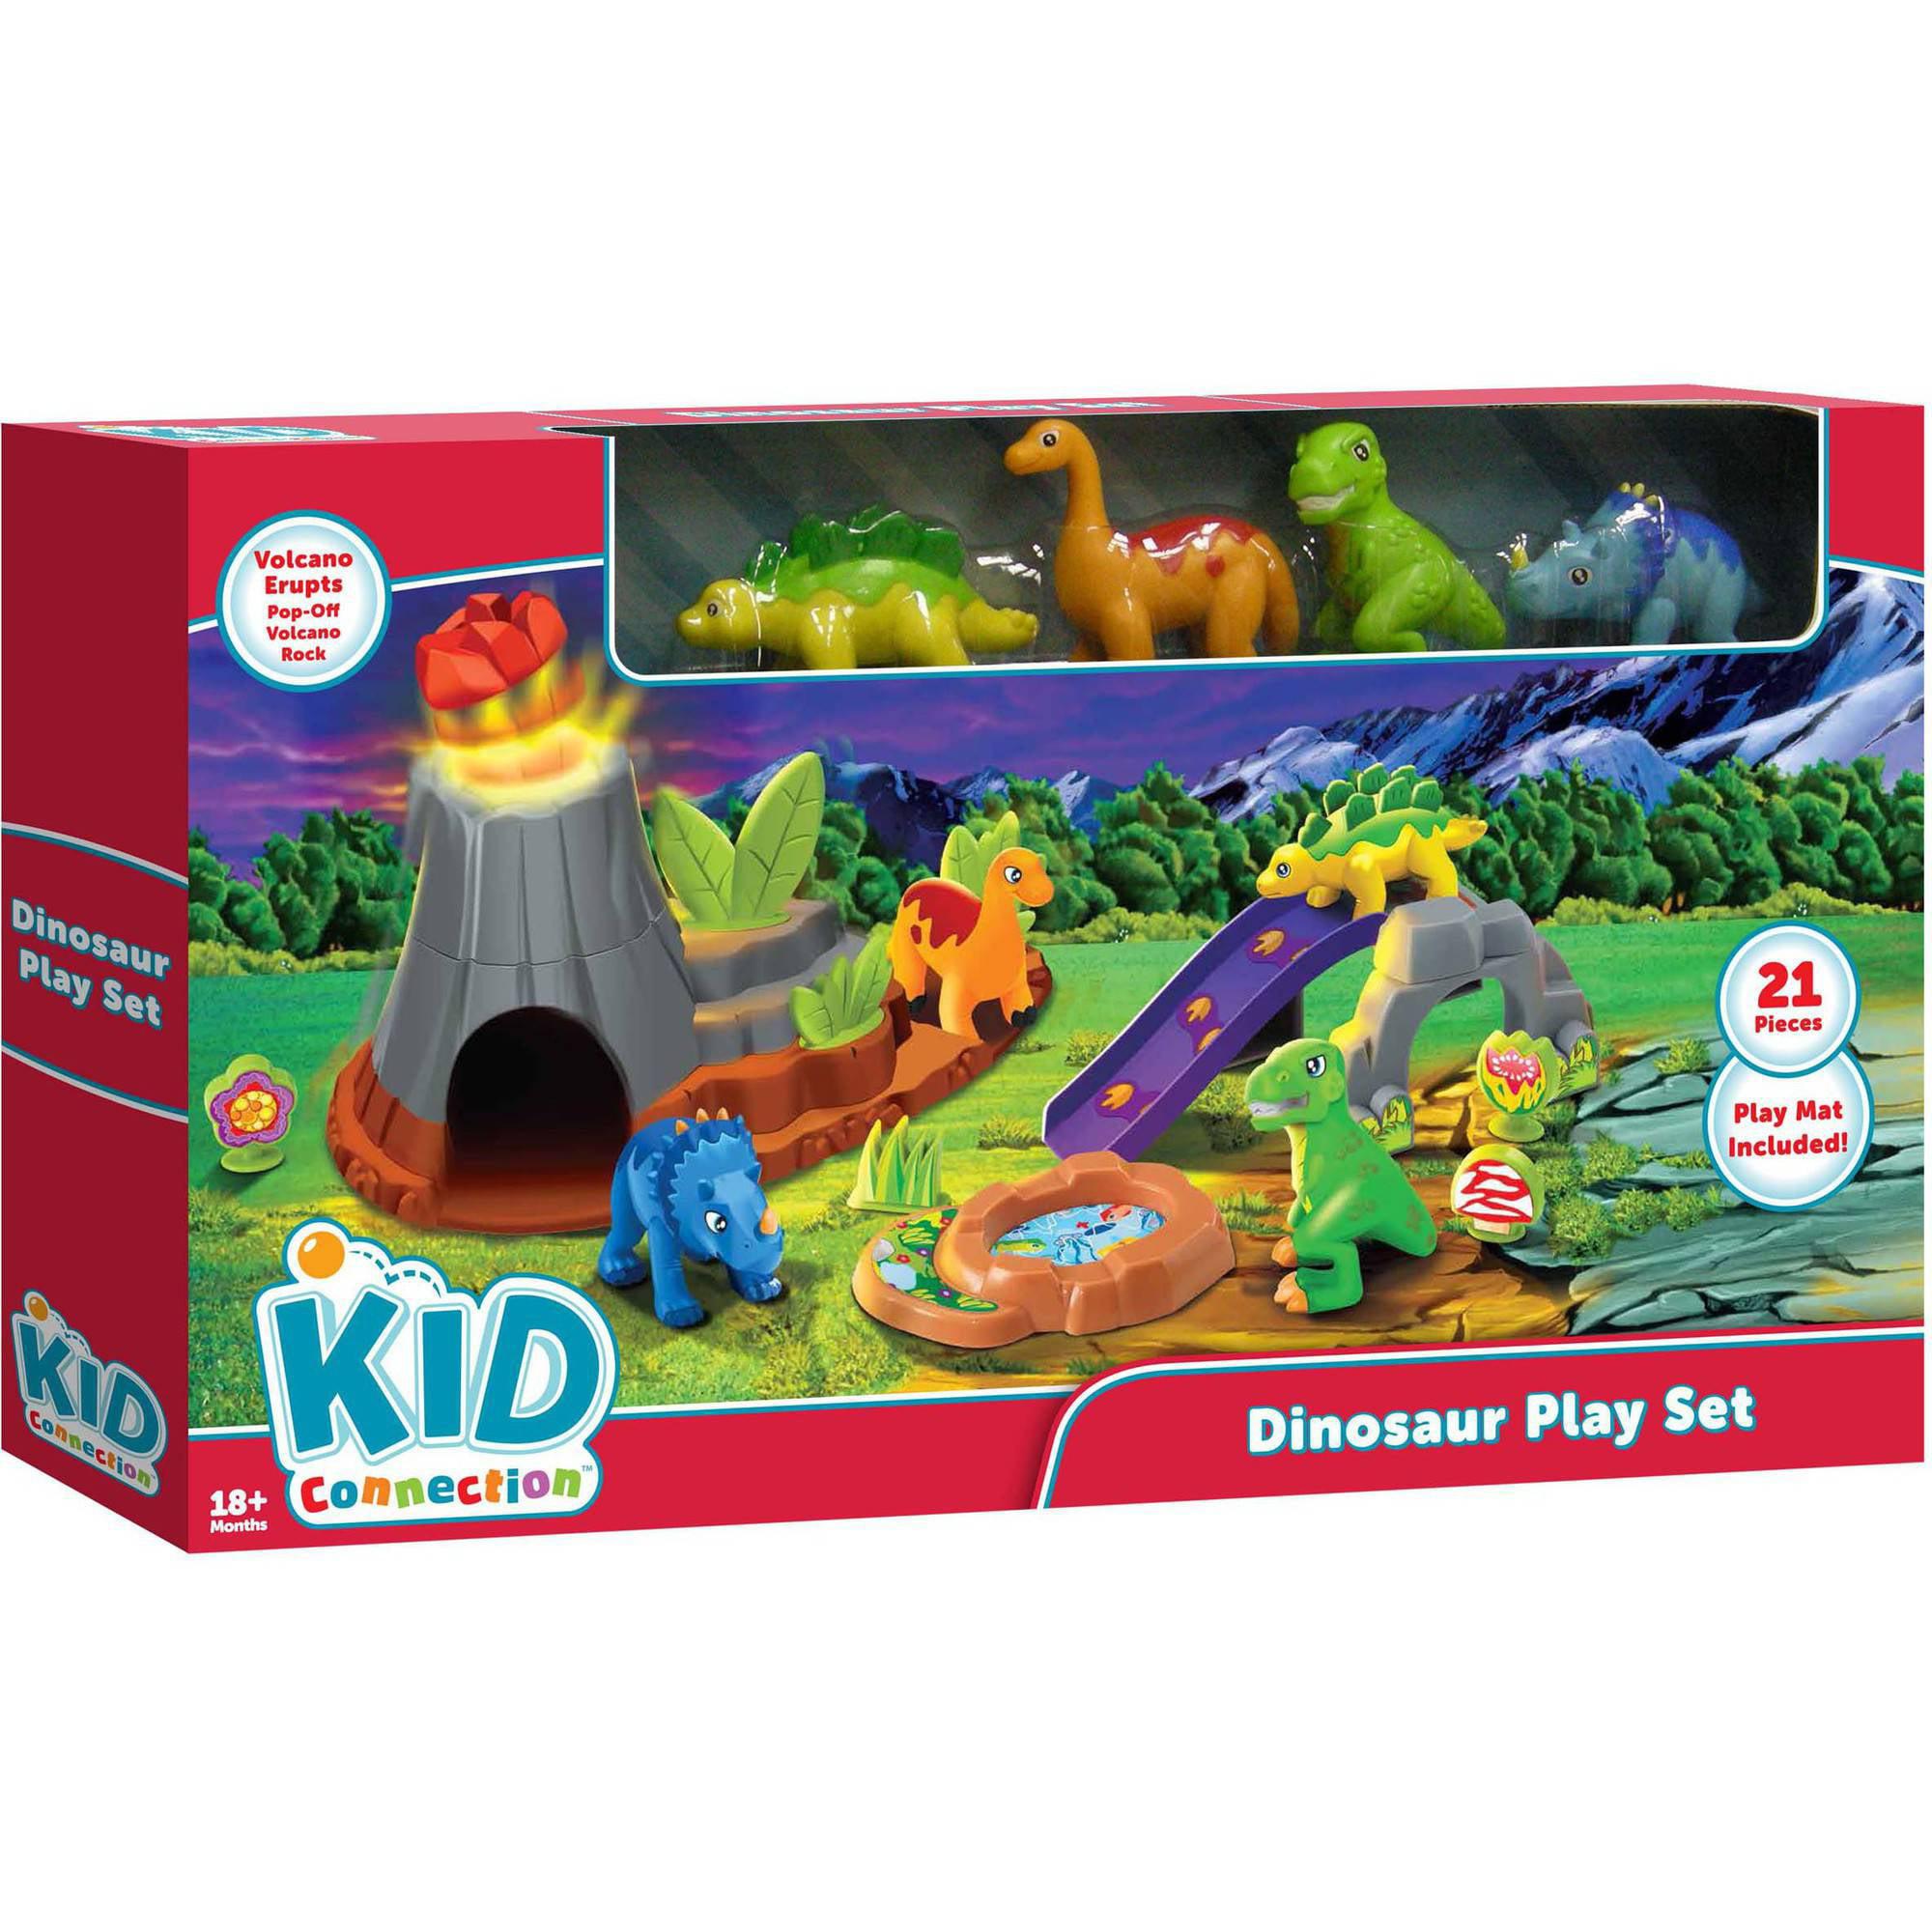 Walmart Dinosaur Toys : Funko pop movies rocky horror picture show columbia